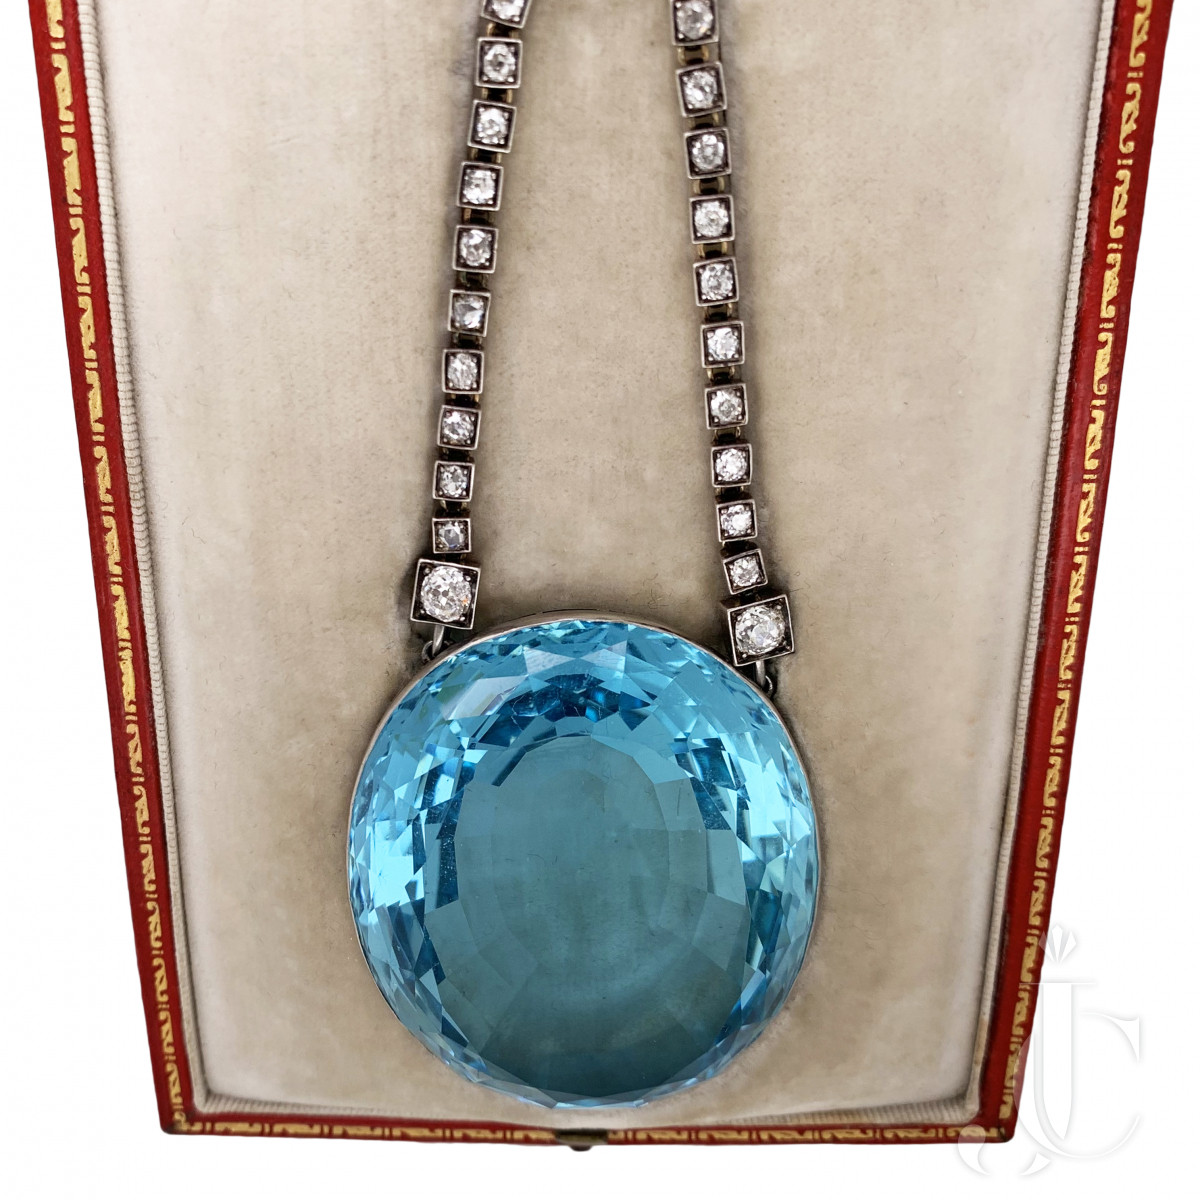 One of a Kind Antique Aquamarine Diamond Pendant